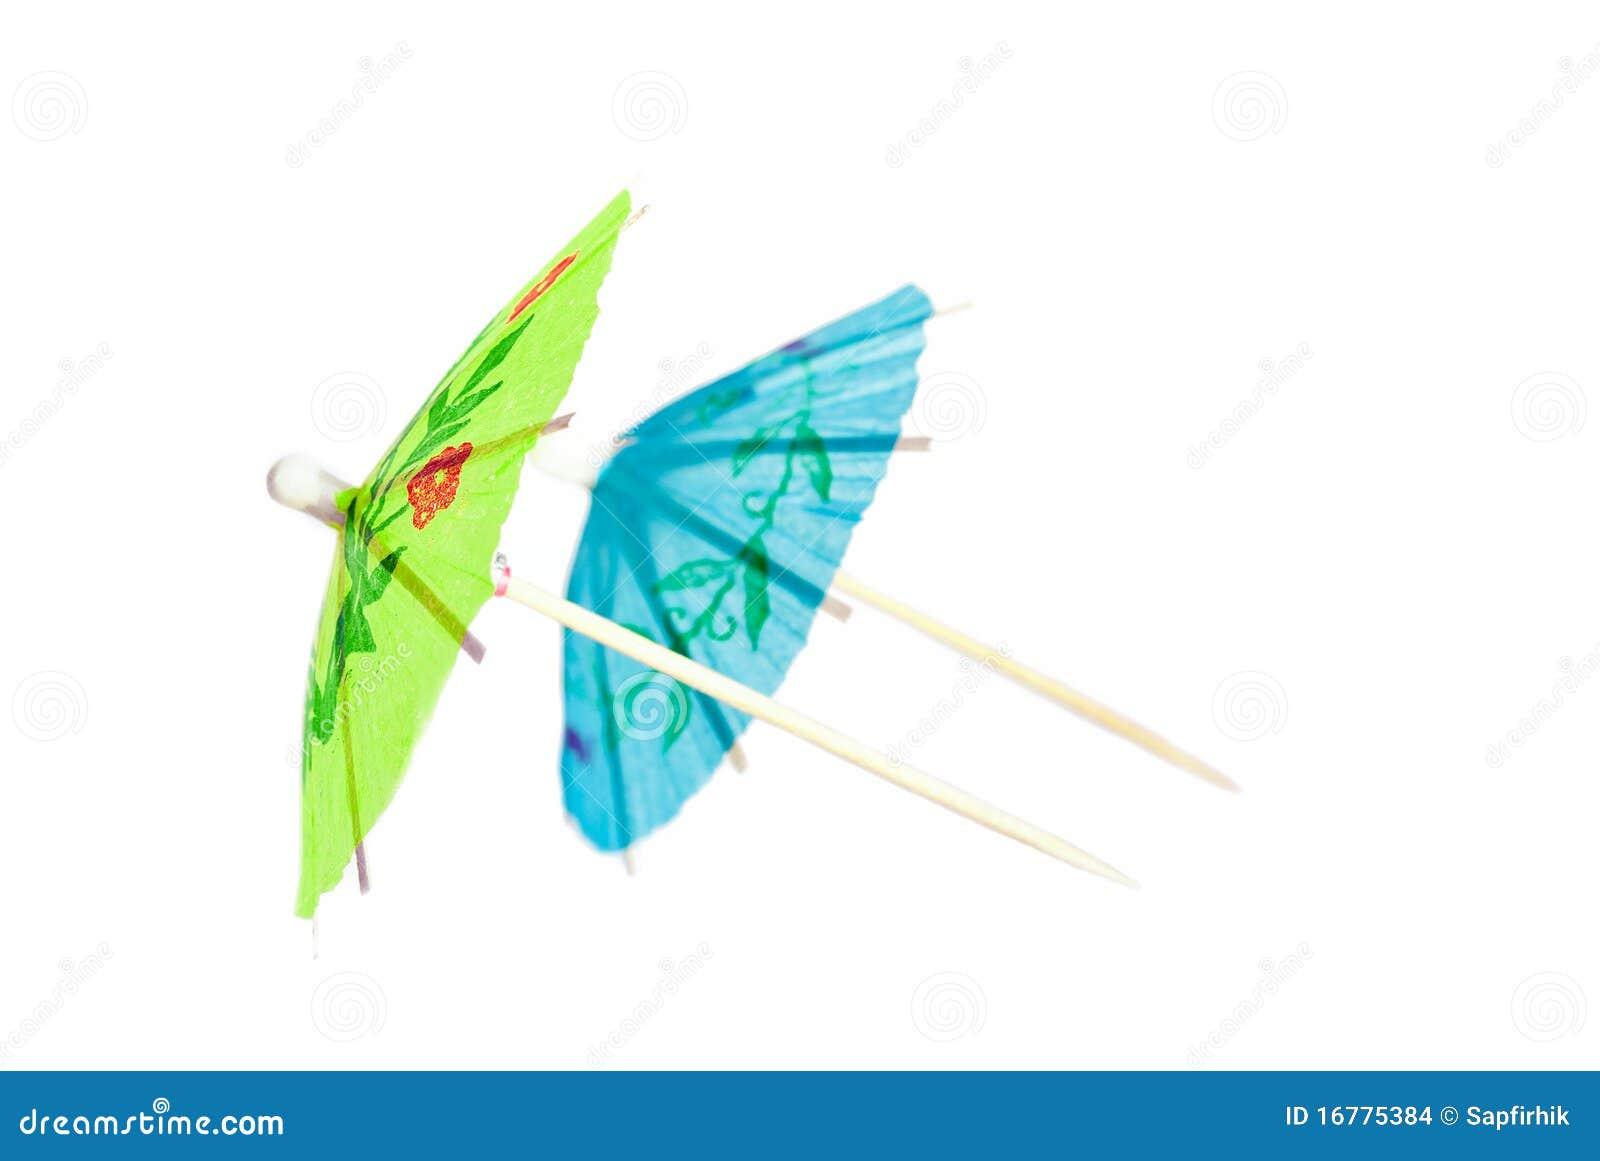 cocktail umbrella stock images image 16775384